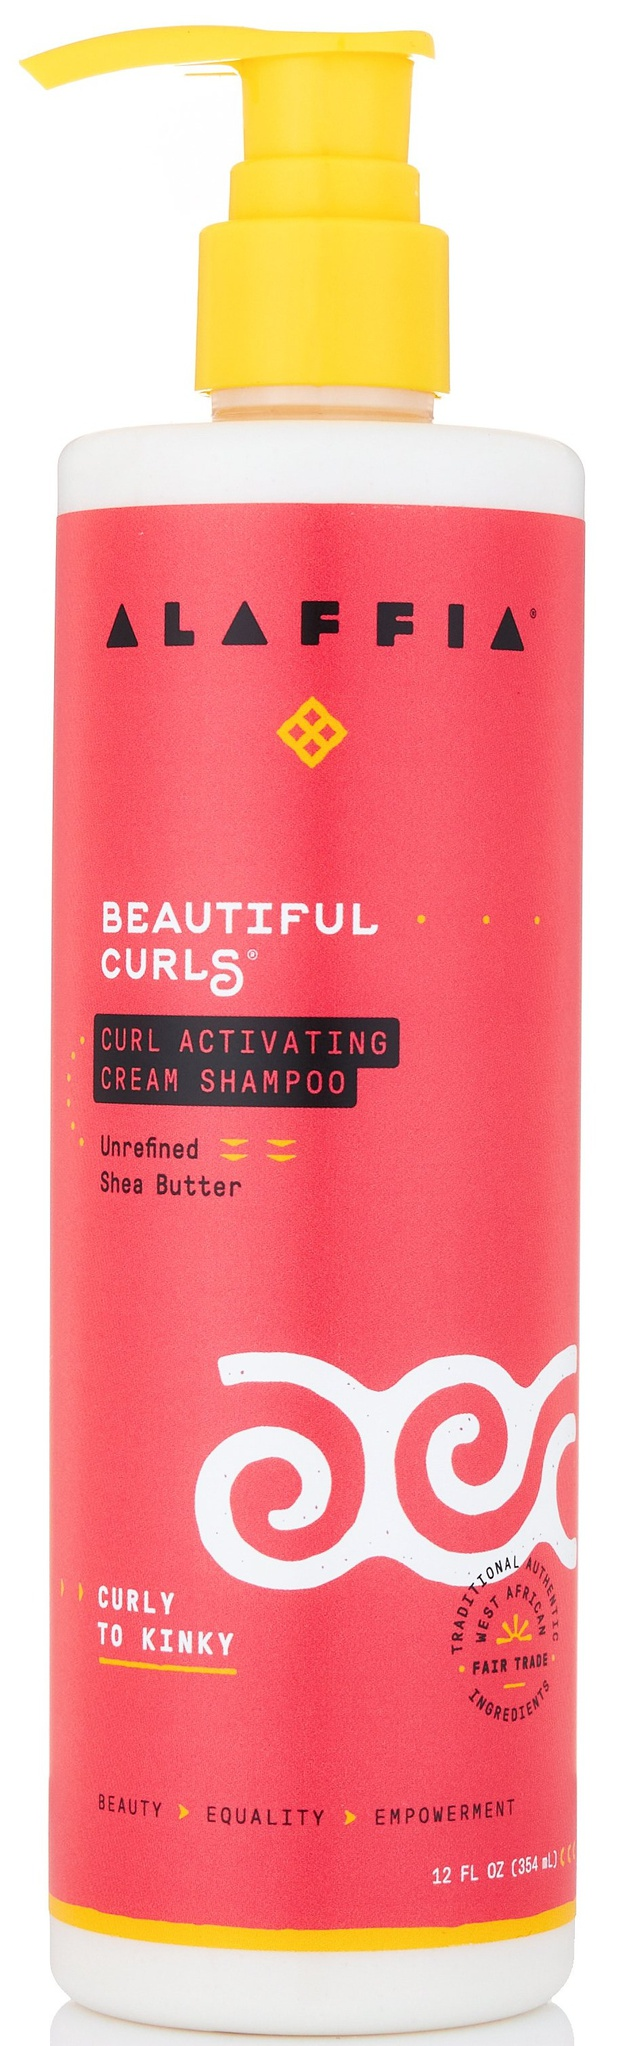 Alaffia Curl Activating Cream Shampoo